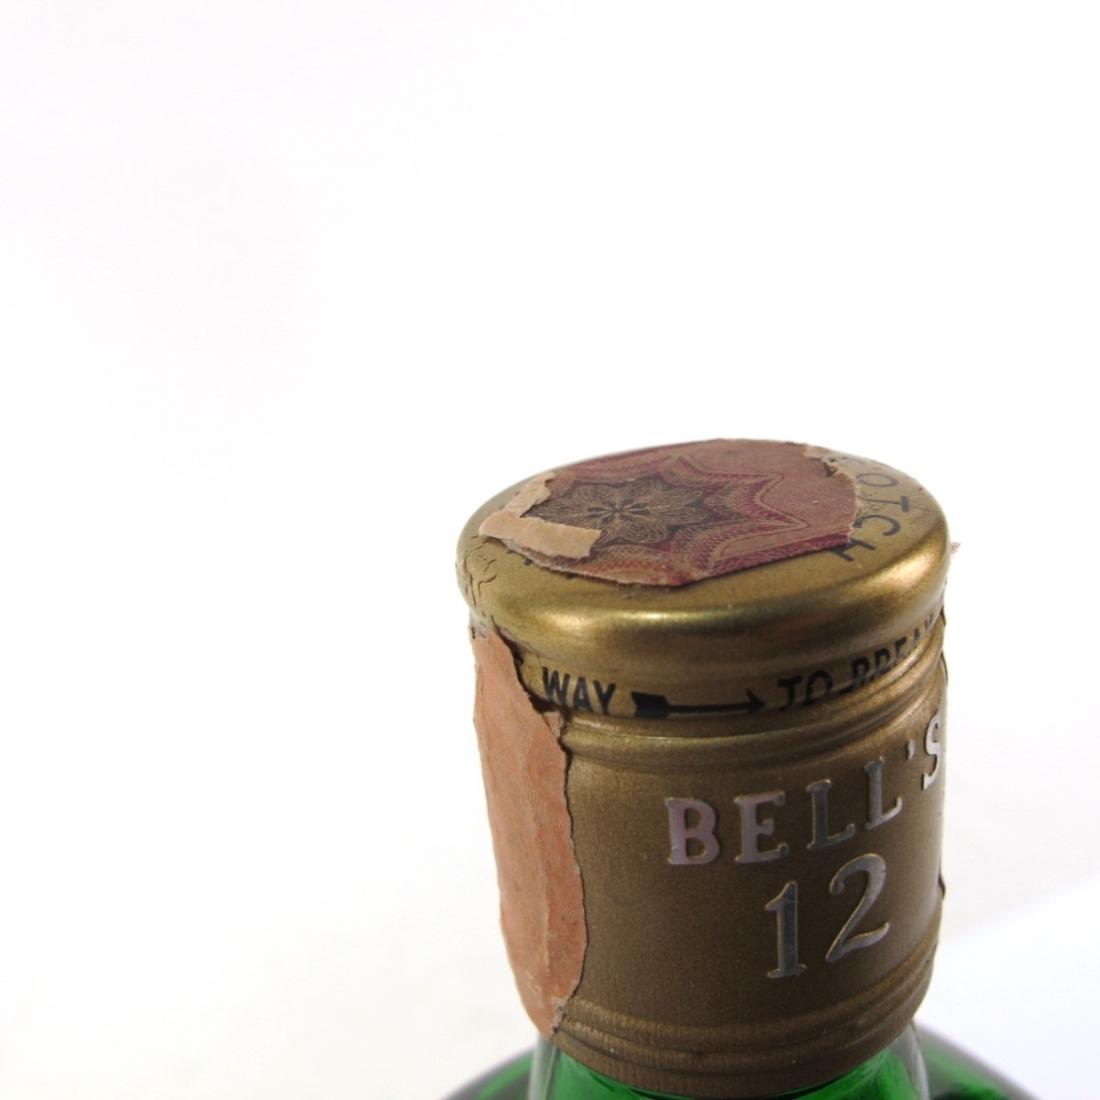 Bell's 12 Year Old De Luxe 1970s